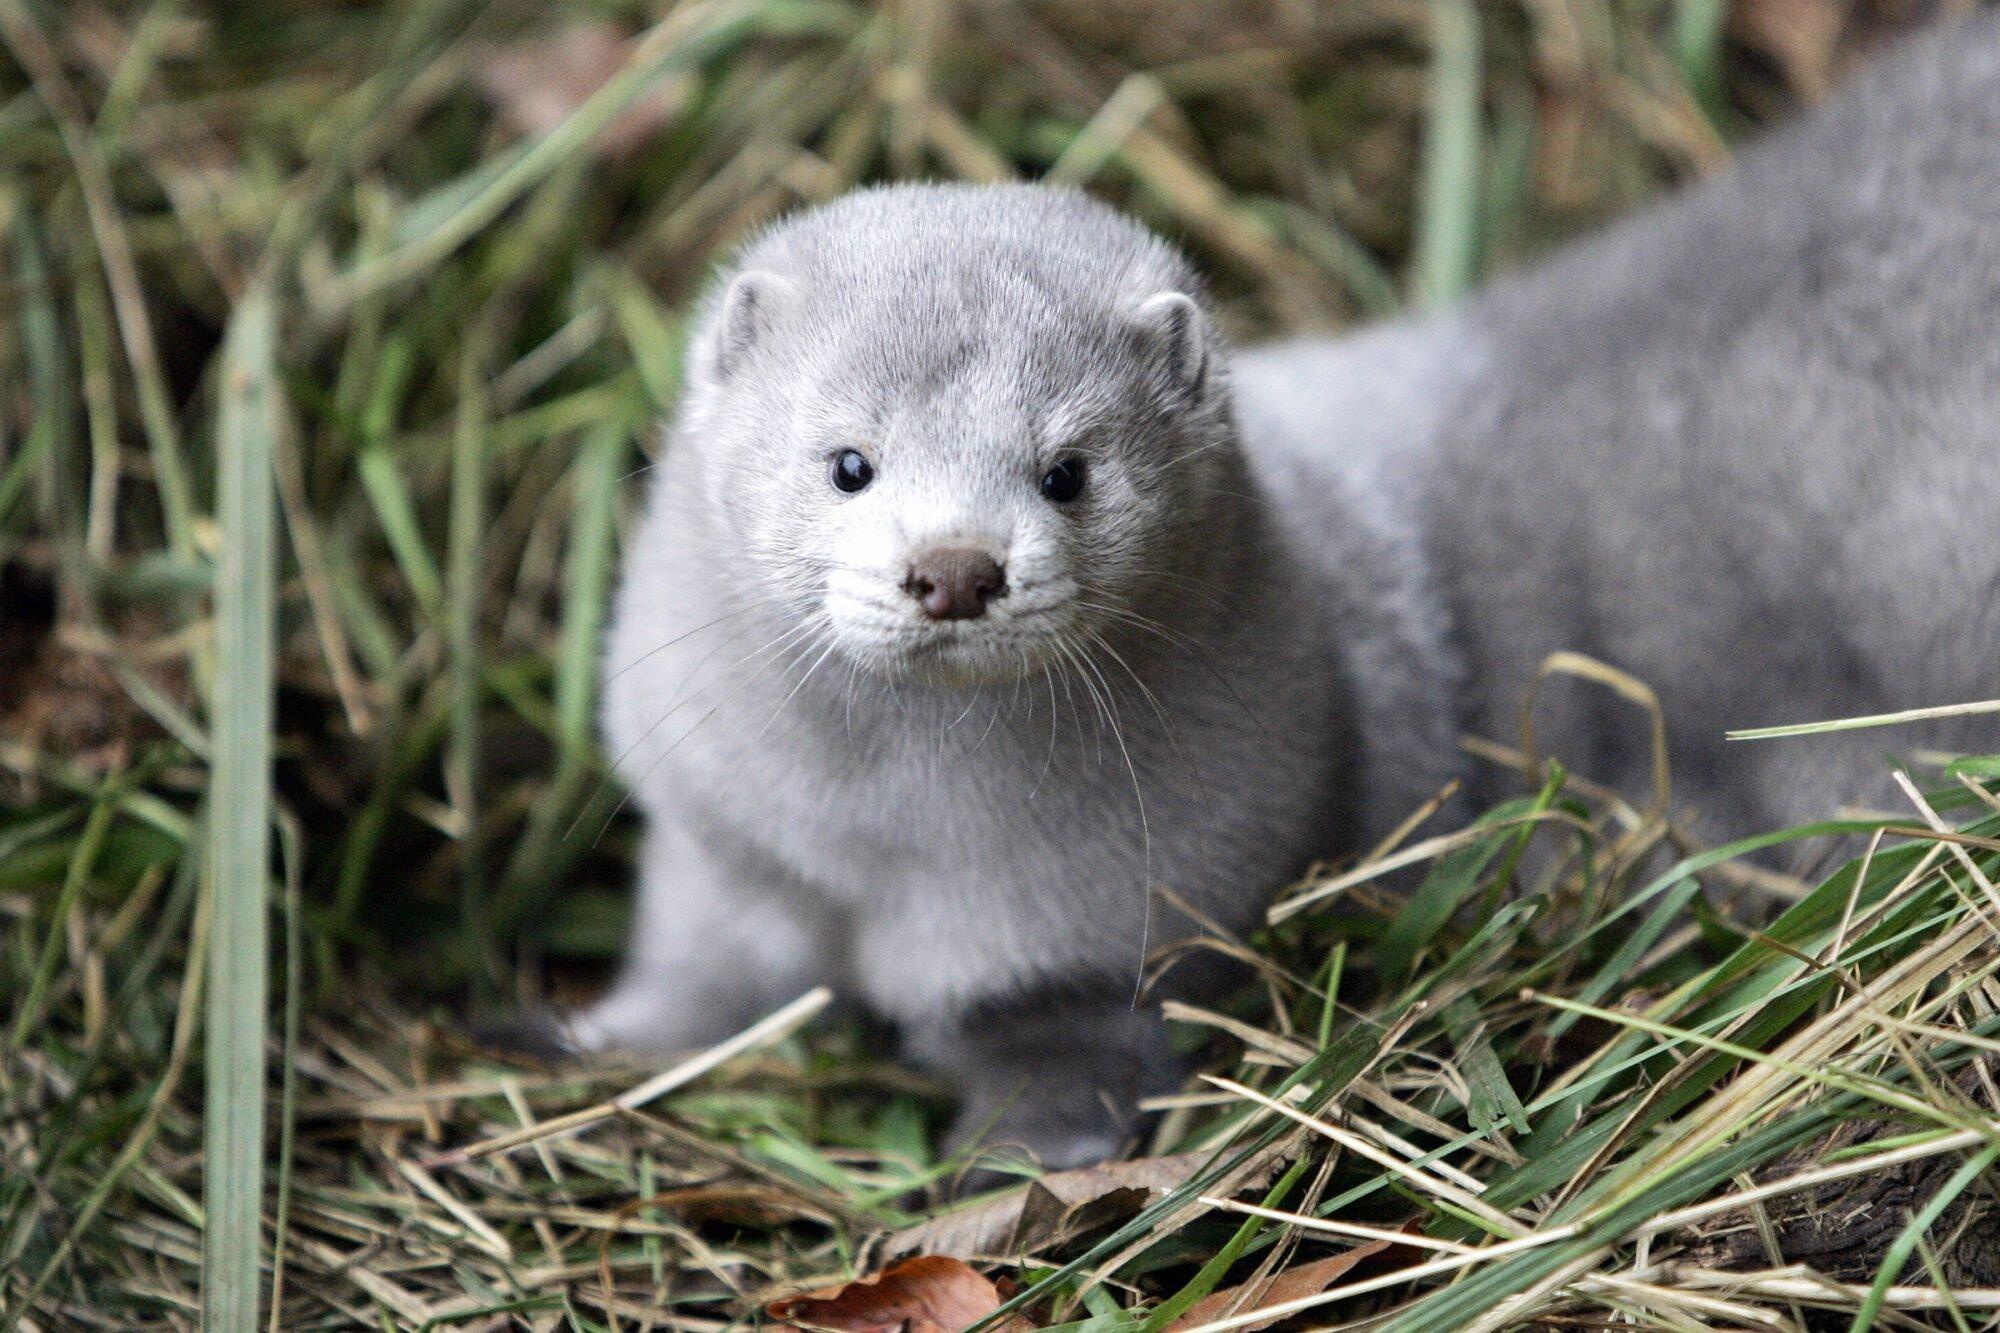 Denmark announces cull of 15 million mink over Covid mutation fears